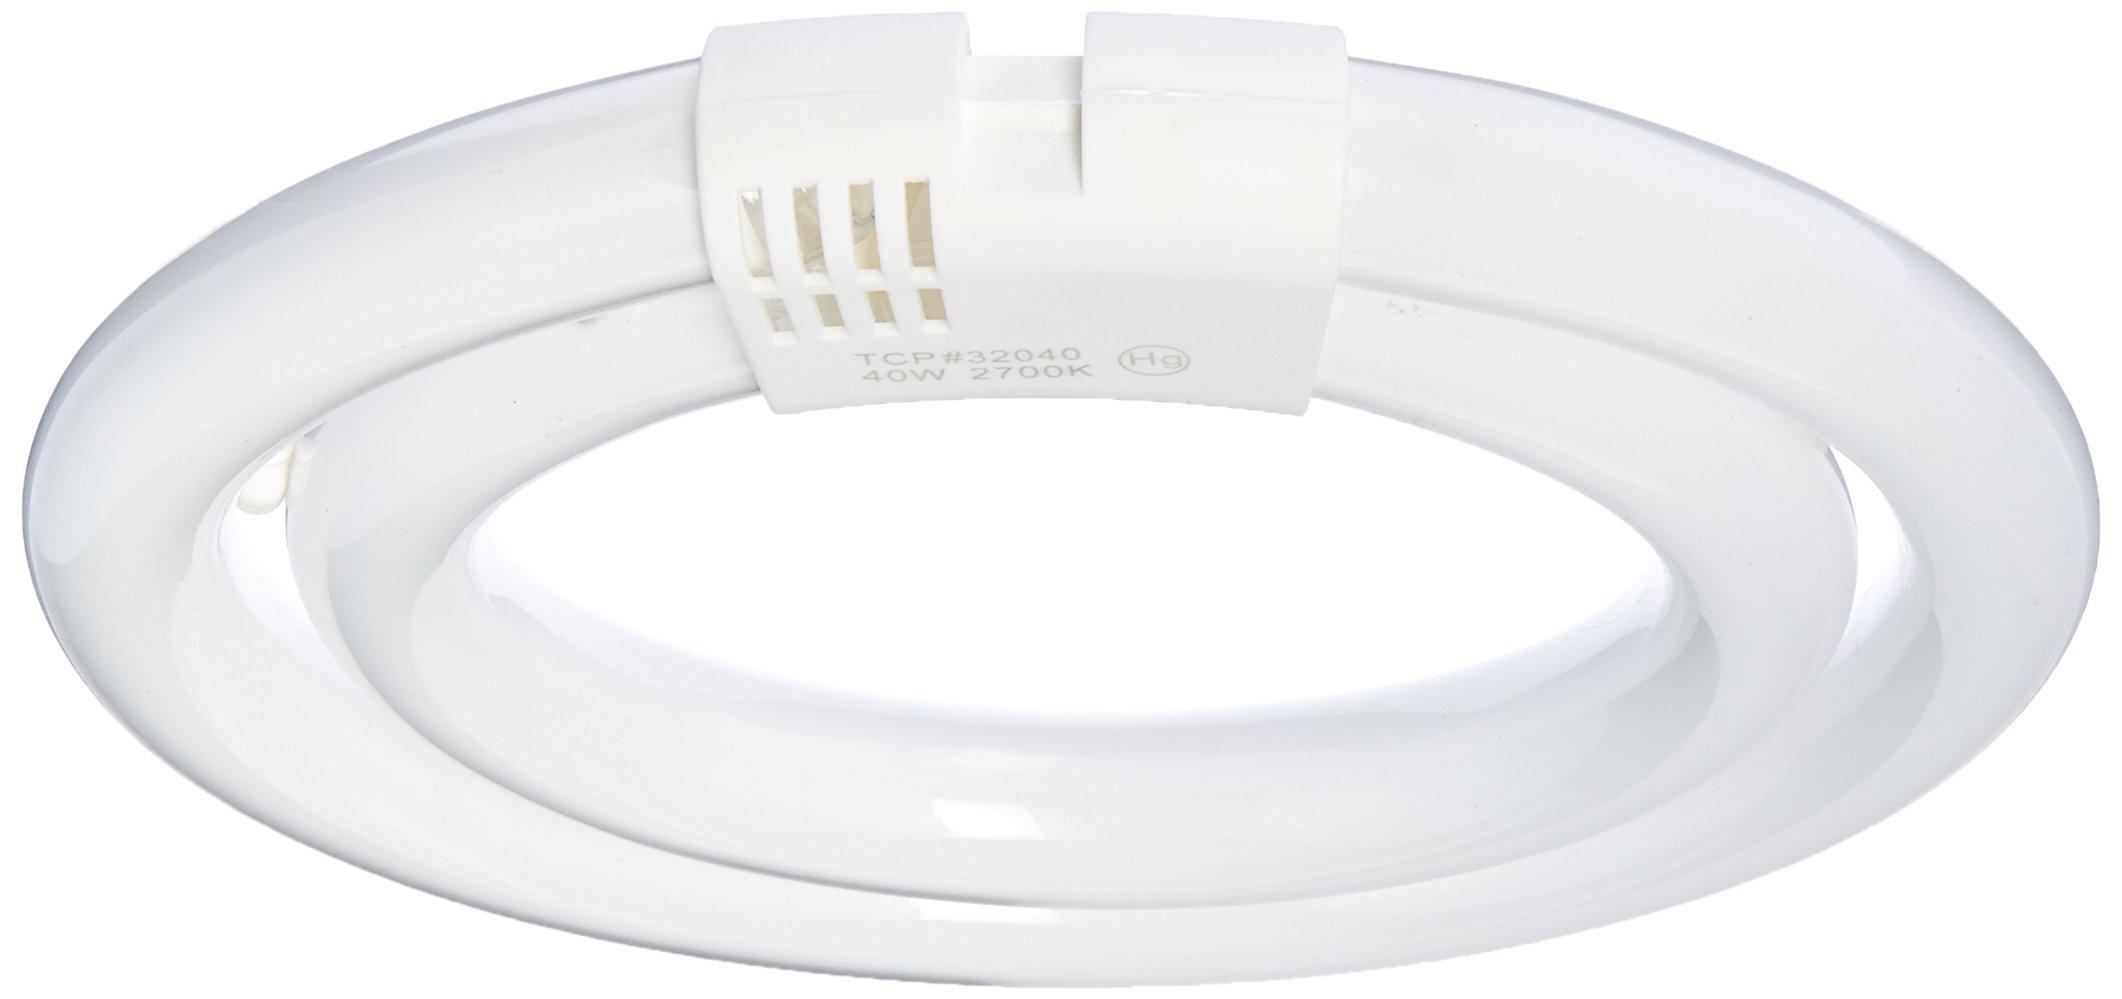 (Case of 10) TCP 32040 40-Watt 2700K Double T6 Circline Lamp, 150W Equivalent